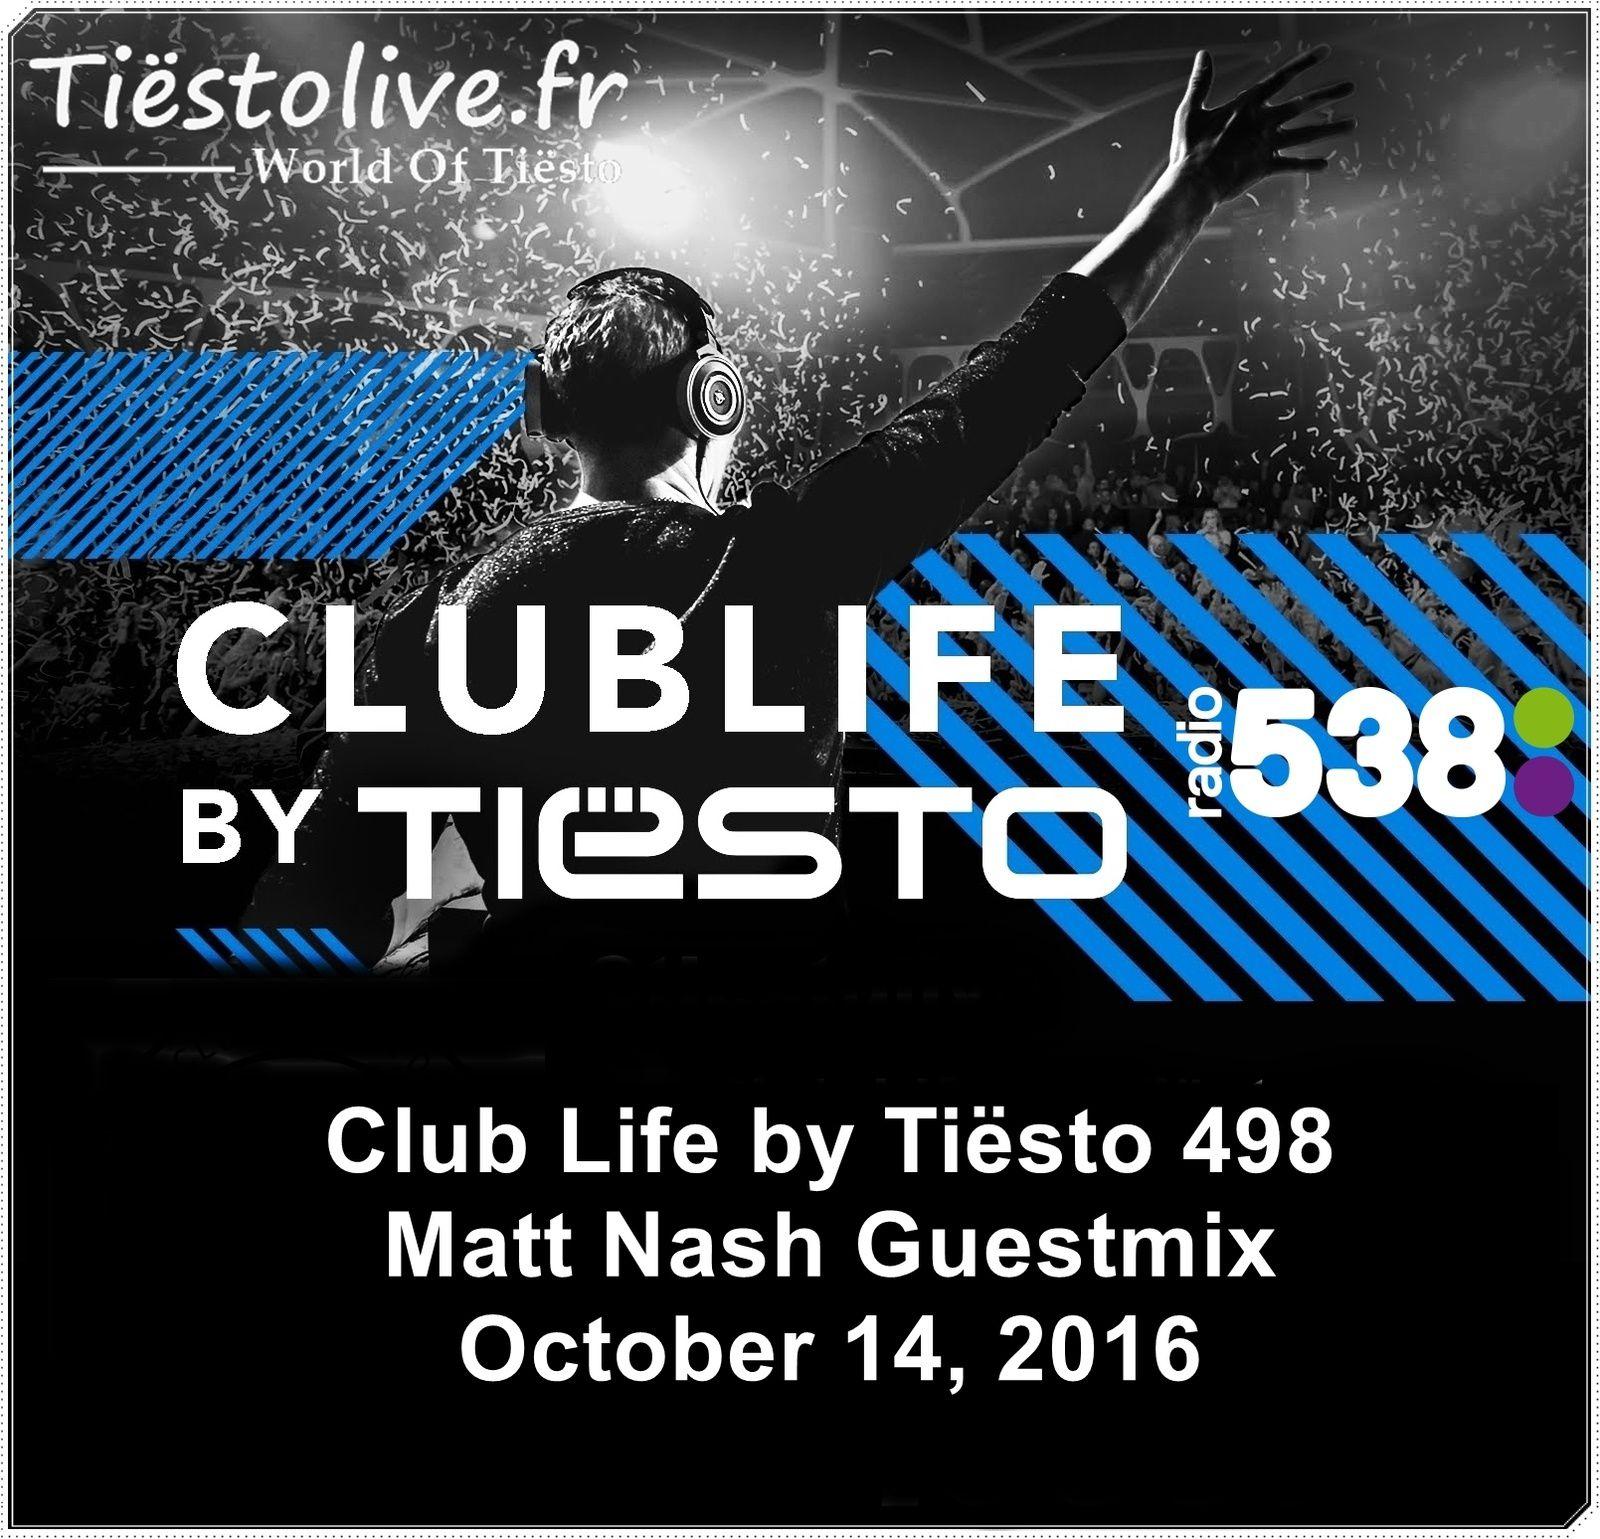 Club Life by Tiësto 498 - Matt Nash Guestmix - October 14, 2016